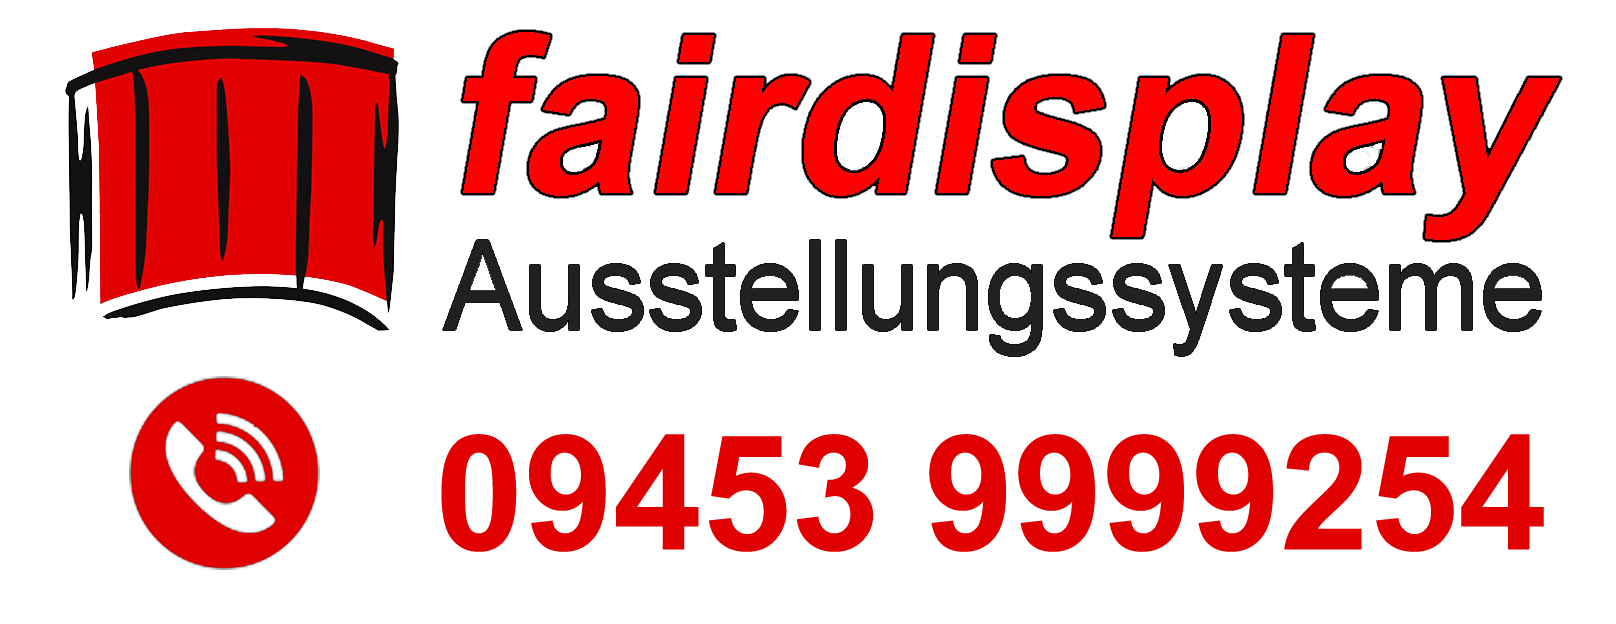 fairdisplay.de